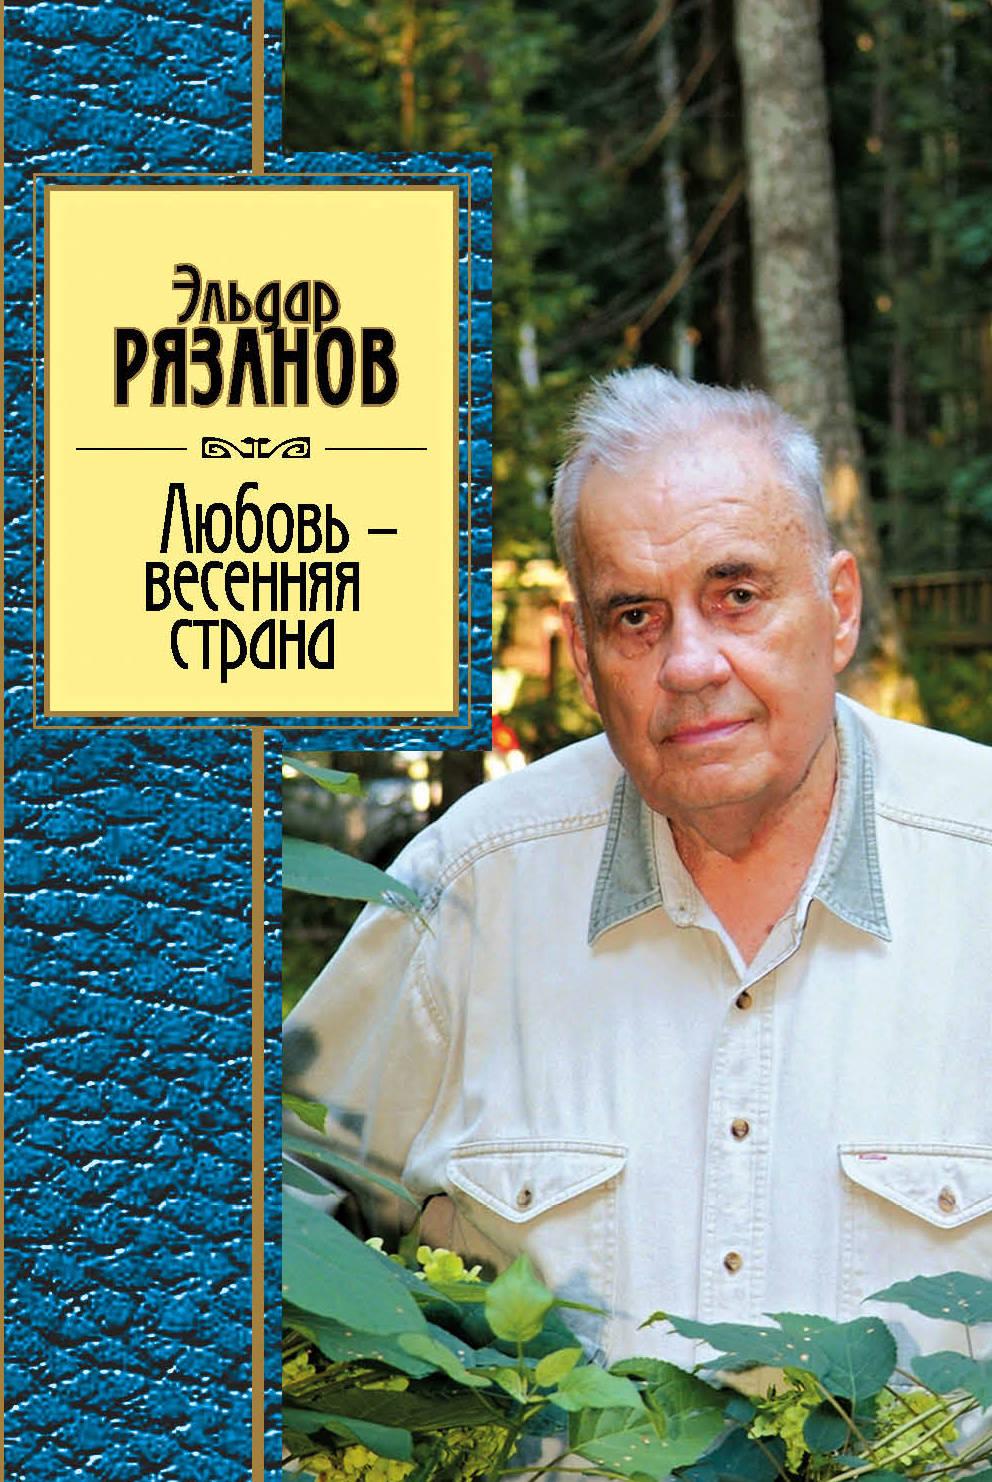 Эльдар Рязанов Любовь - весенняя страна фильмы эльдара рязанова том2 5